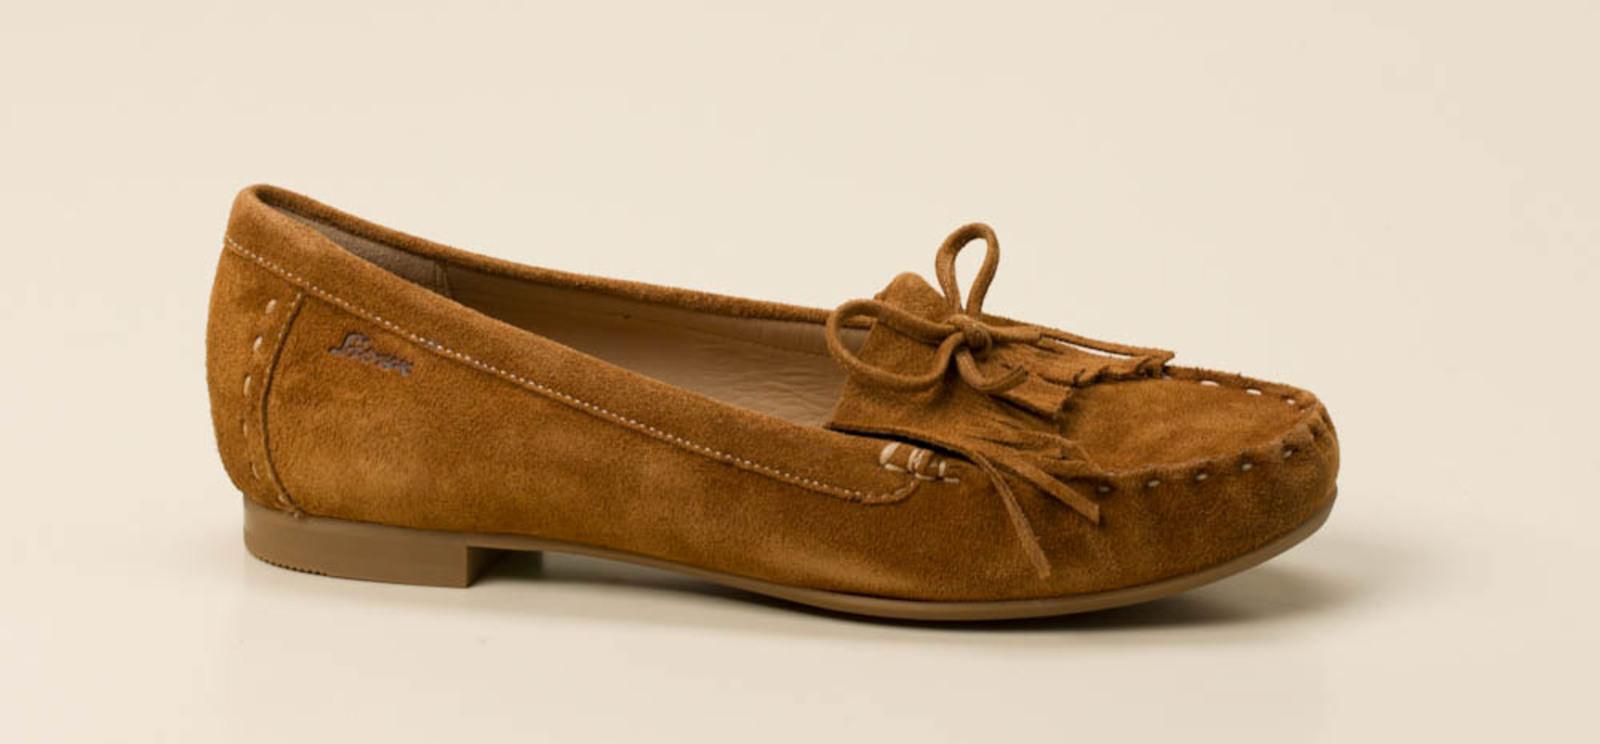 Sioux Damen Mokassin in cognac kaufen   Zumnorde Online-Shop 57b9aa9b1d